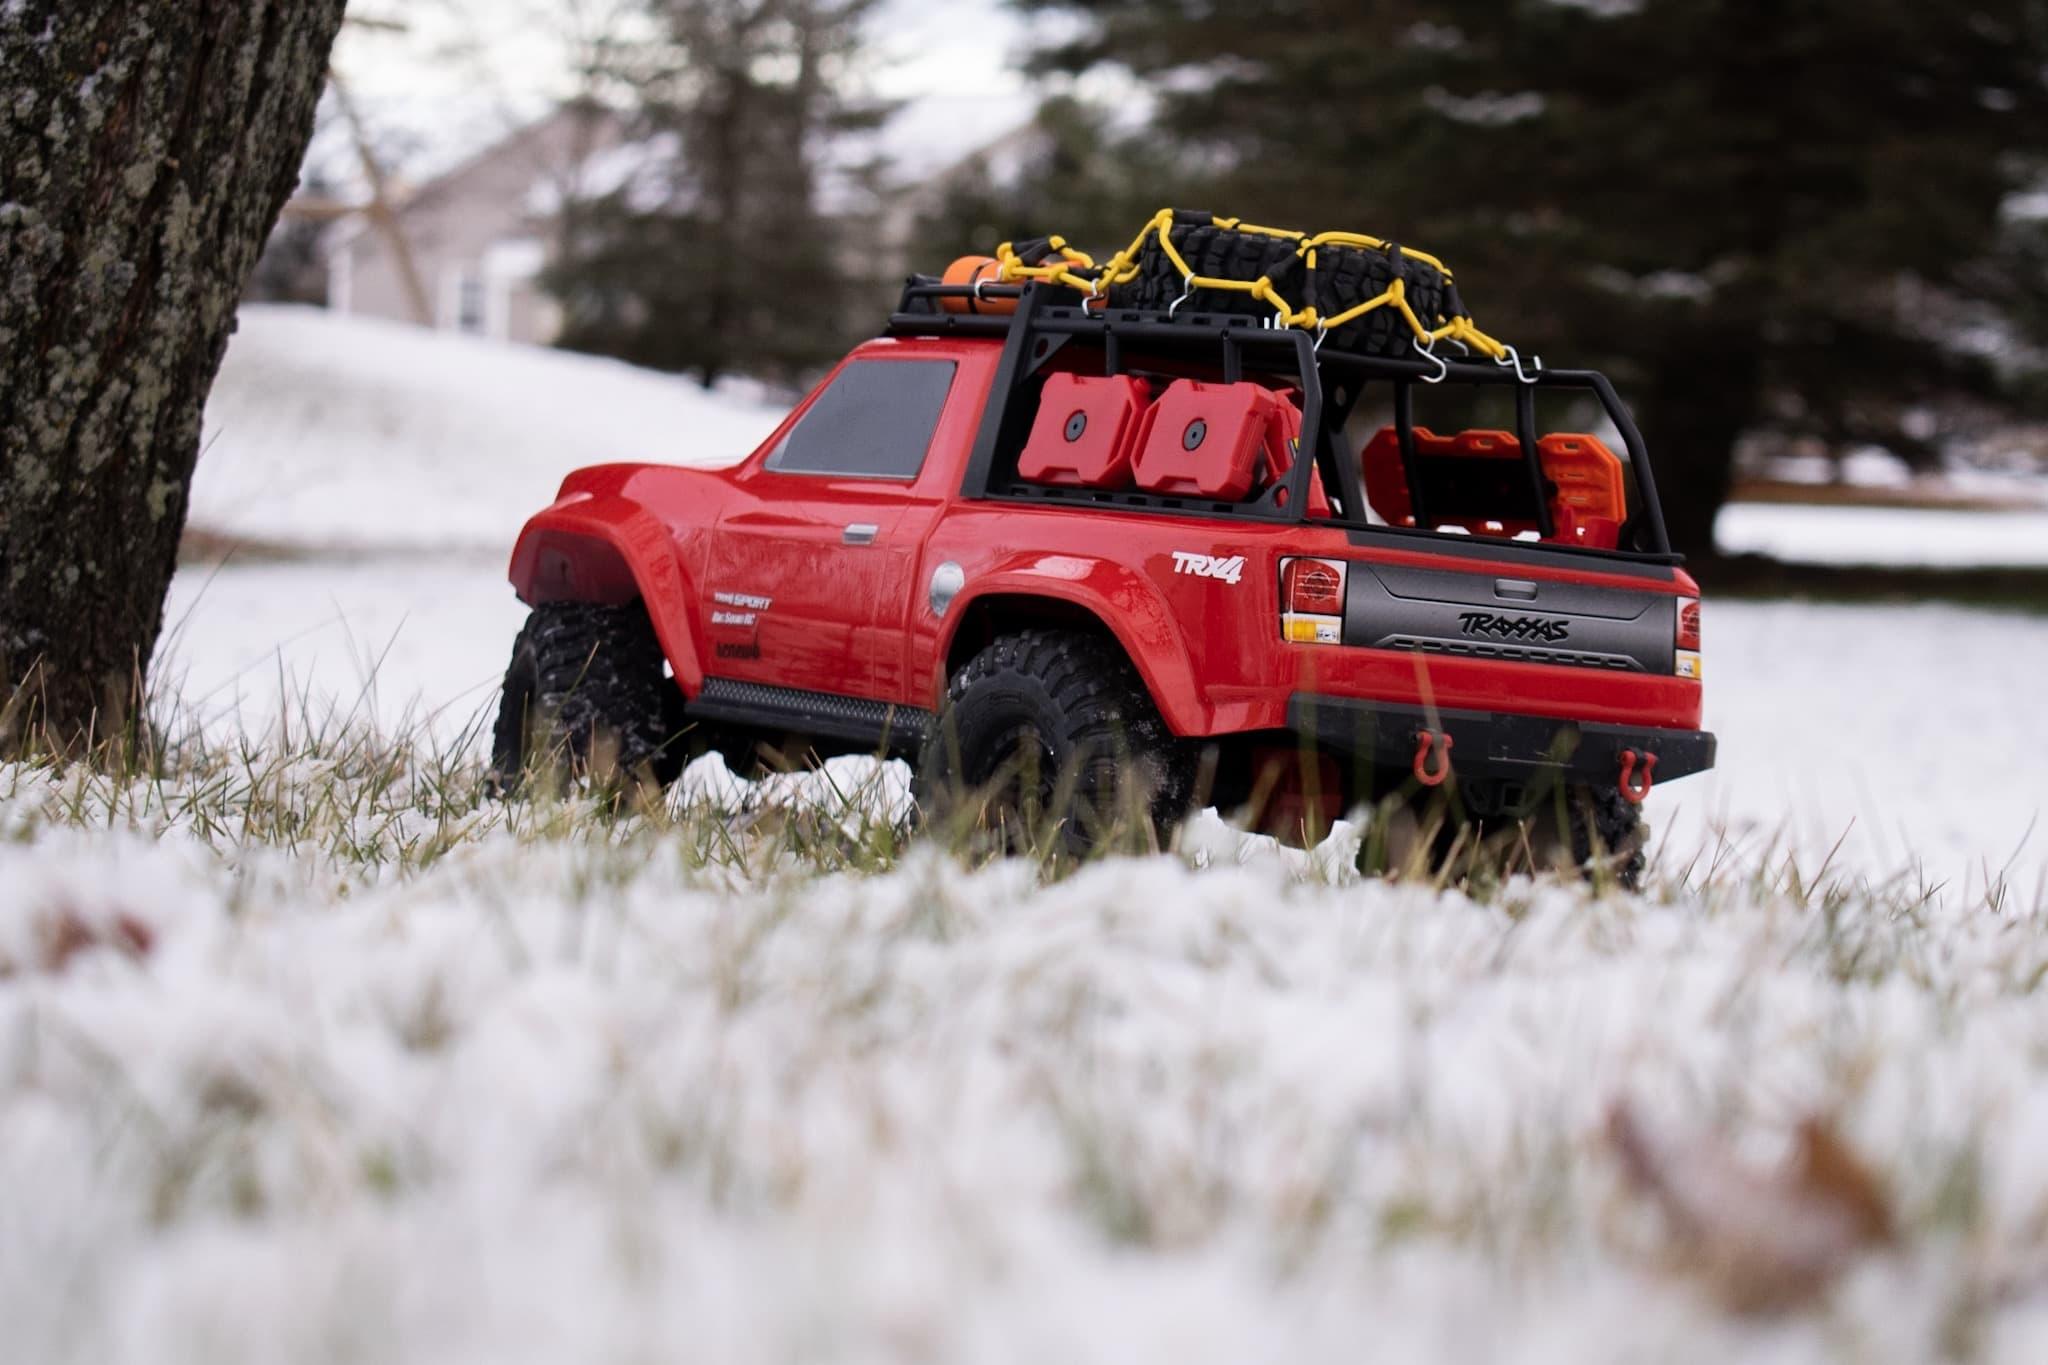 Traxxas TRX-4 Sport - Snowscape